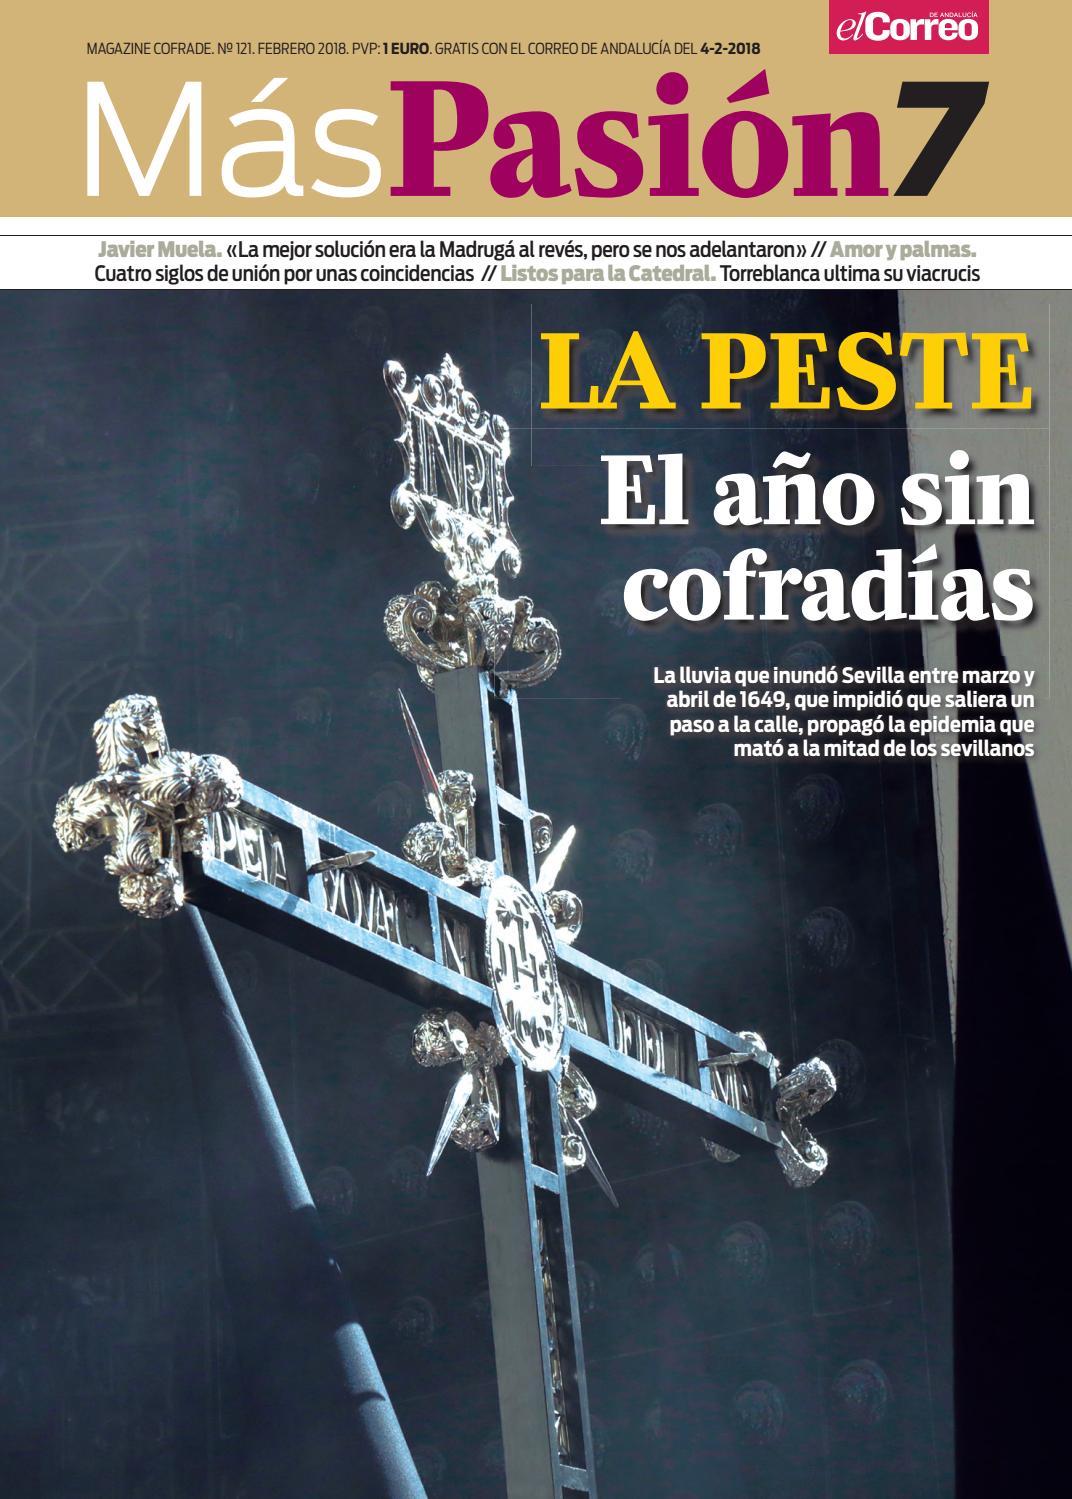 Revista Mp7 Febrero 2018 by EL CORREO DE ANDALUCÍA S.L. - issuu